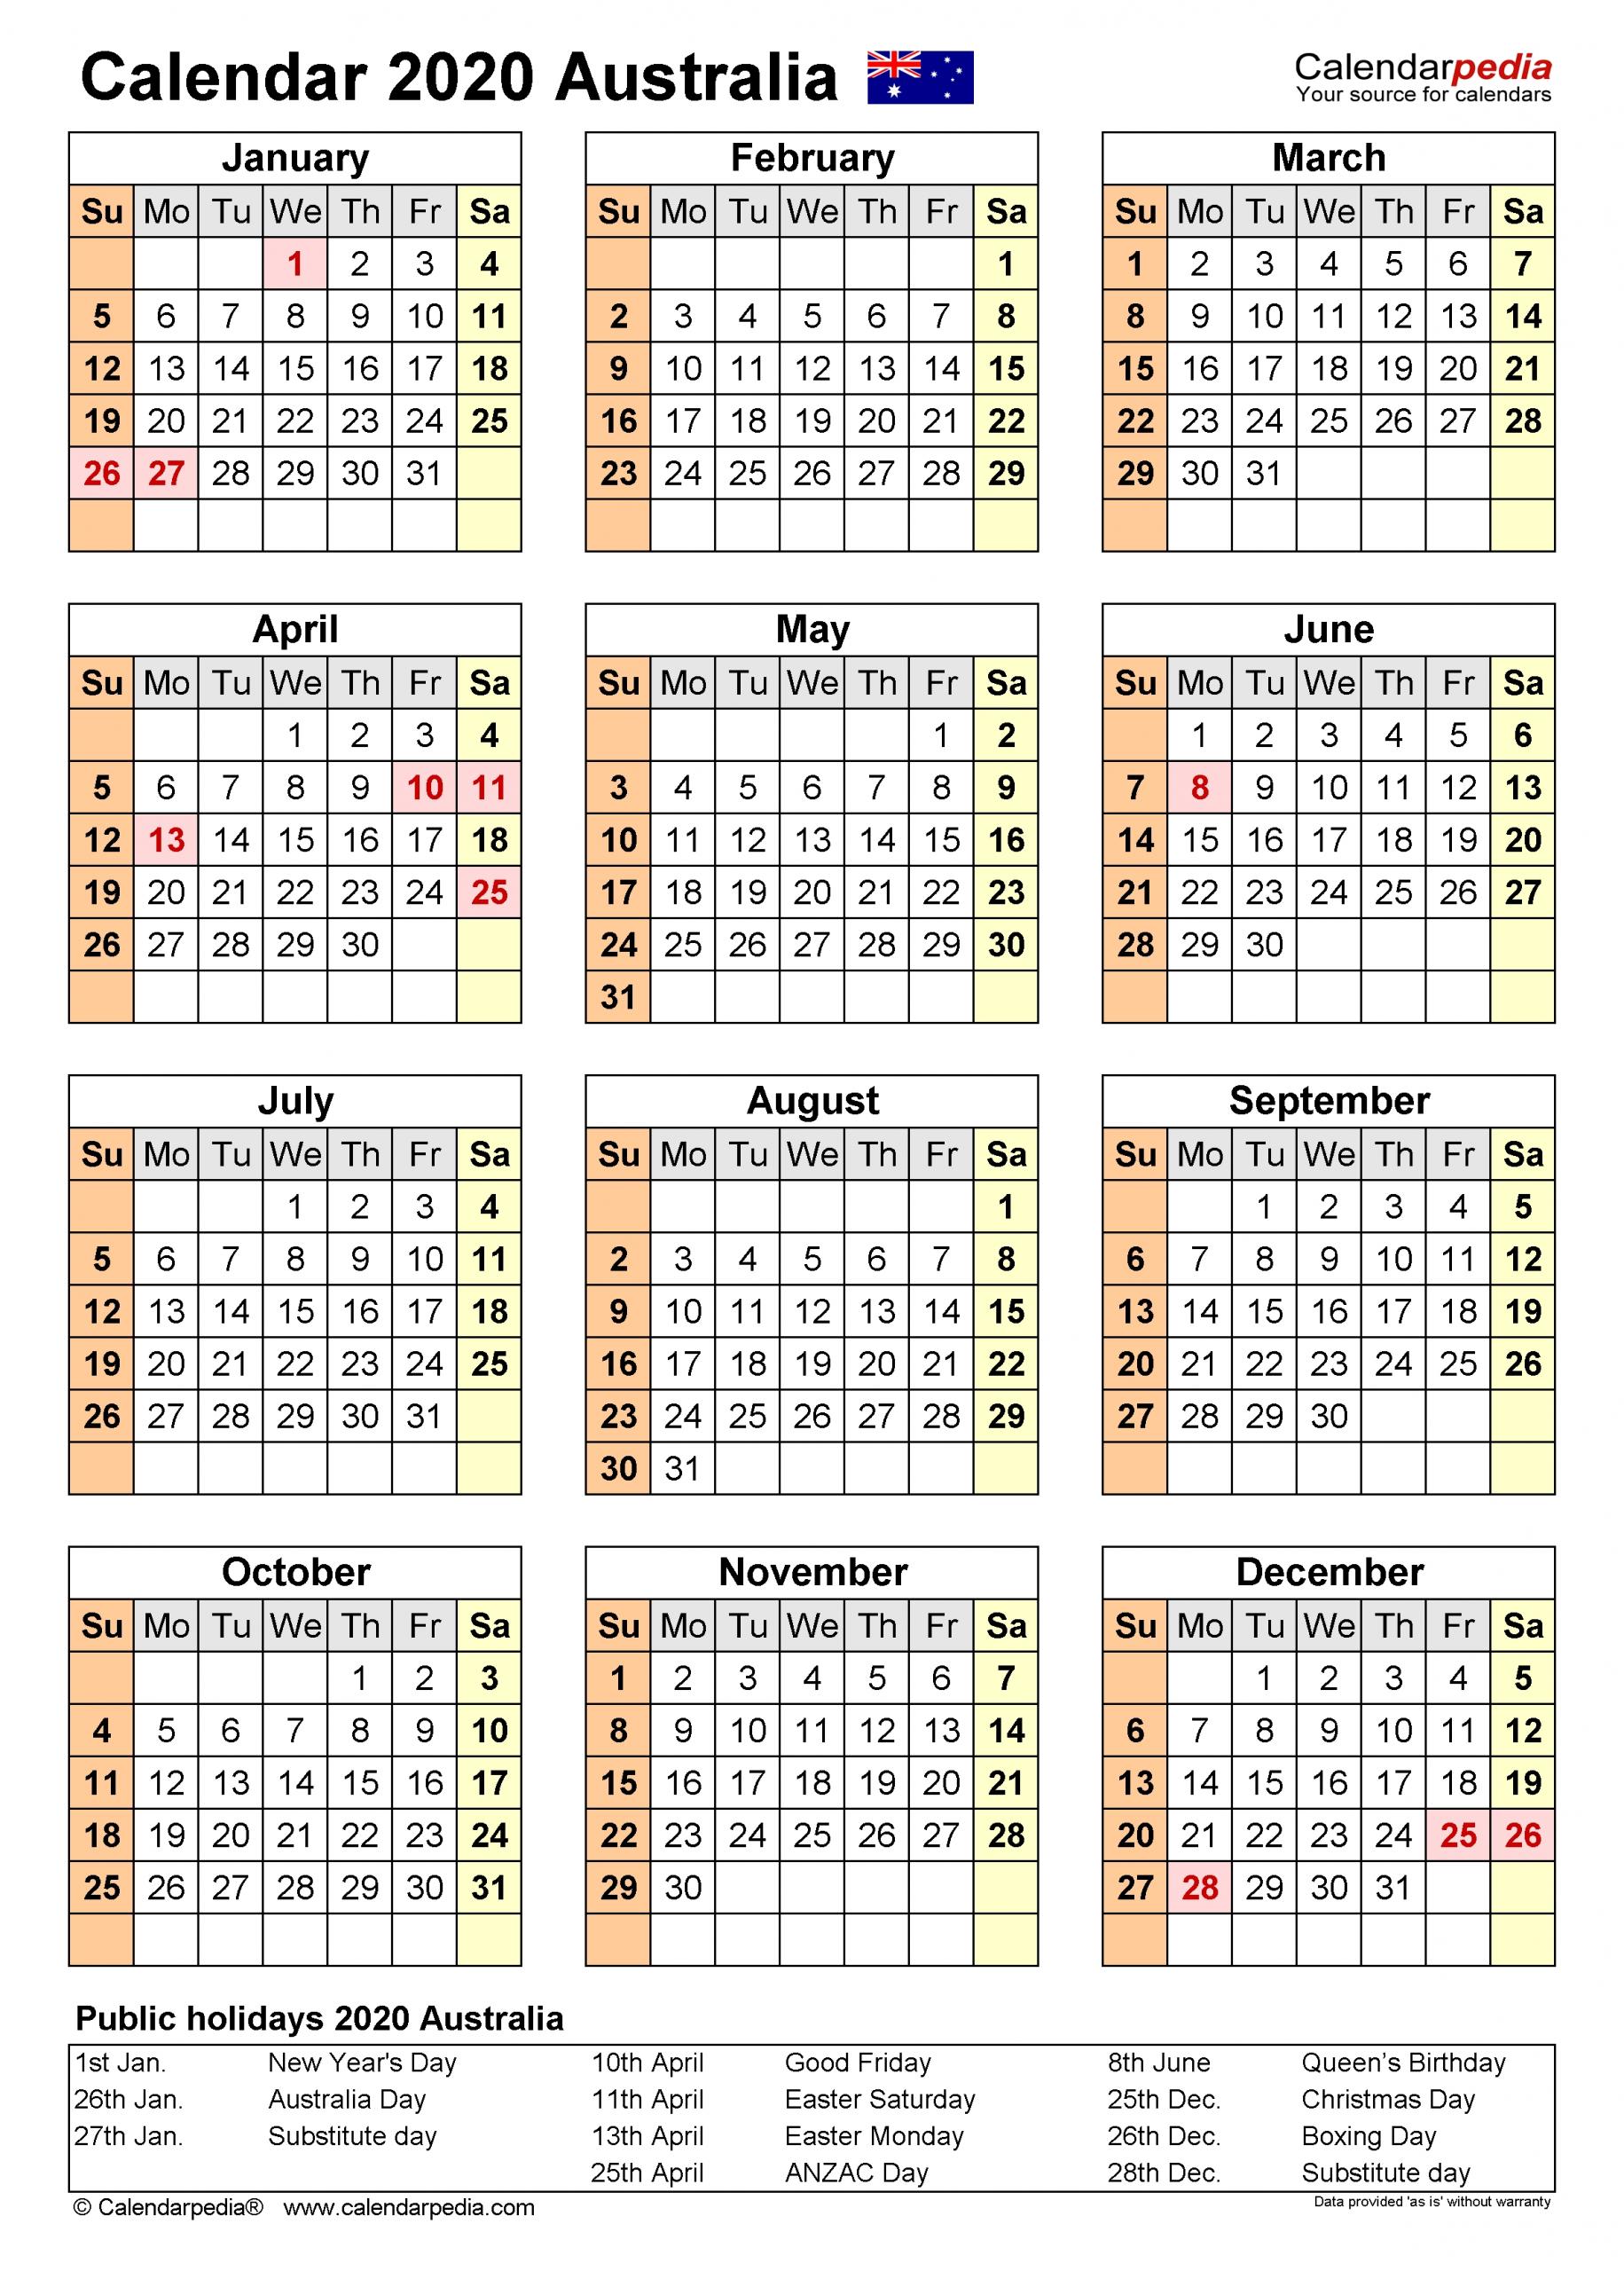 Australia Calendar 2020 - Free Printable Pdf Templates  18 19 Financial Year Dates Australia